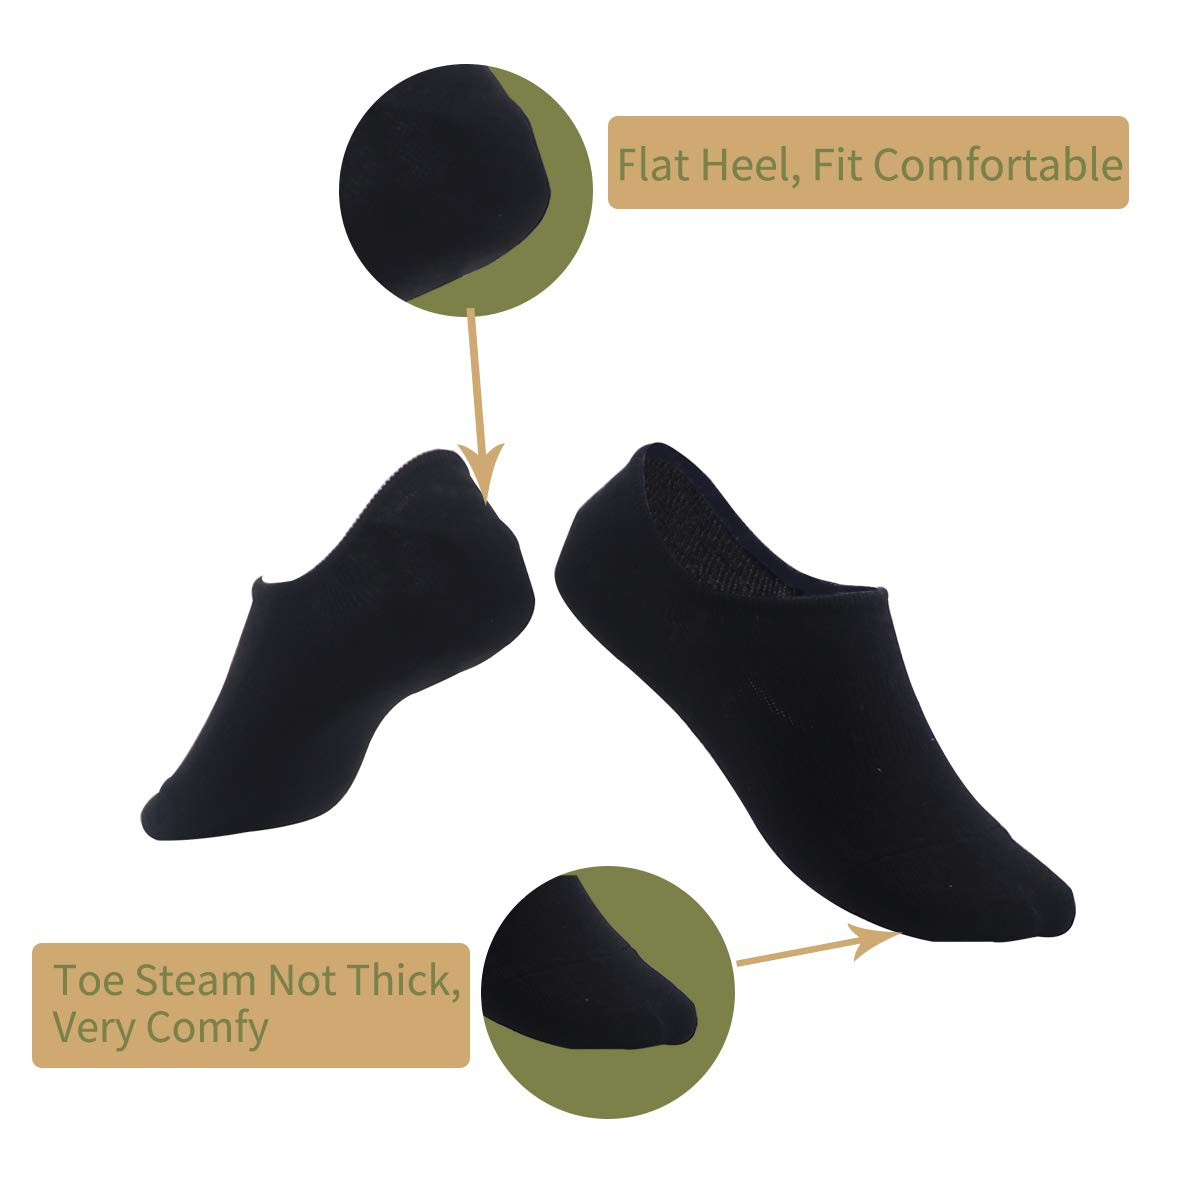 Greuame Low Cut Liner Socks, Combed Cotton Non-Slip Socks for Women 5 Pack